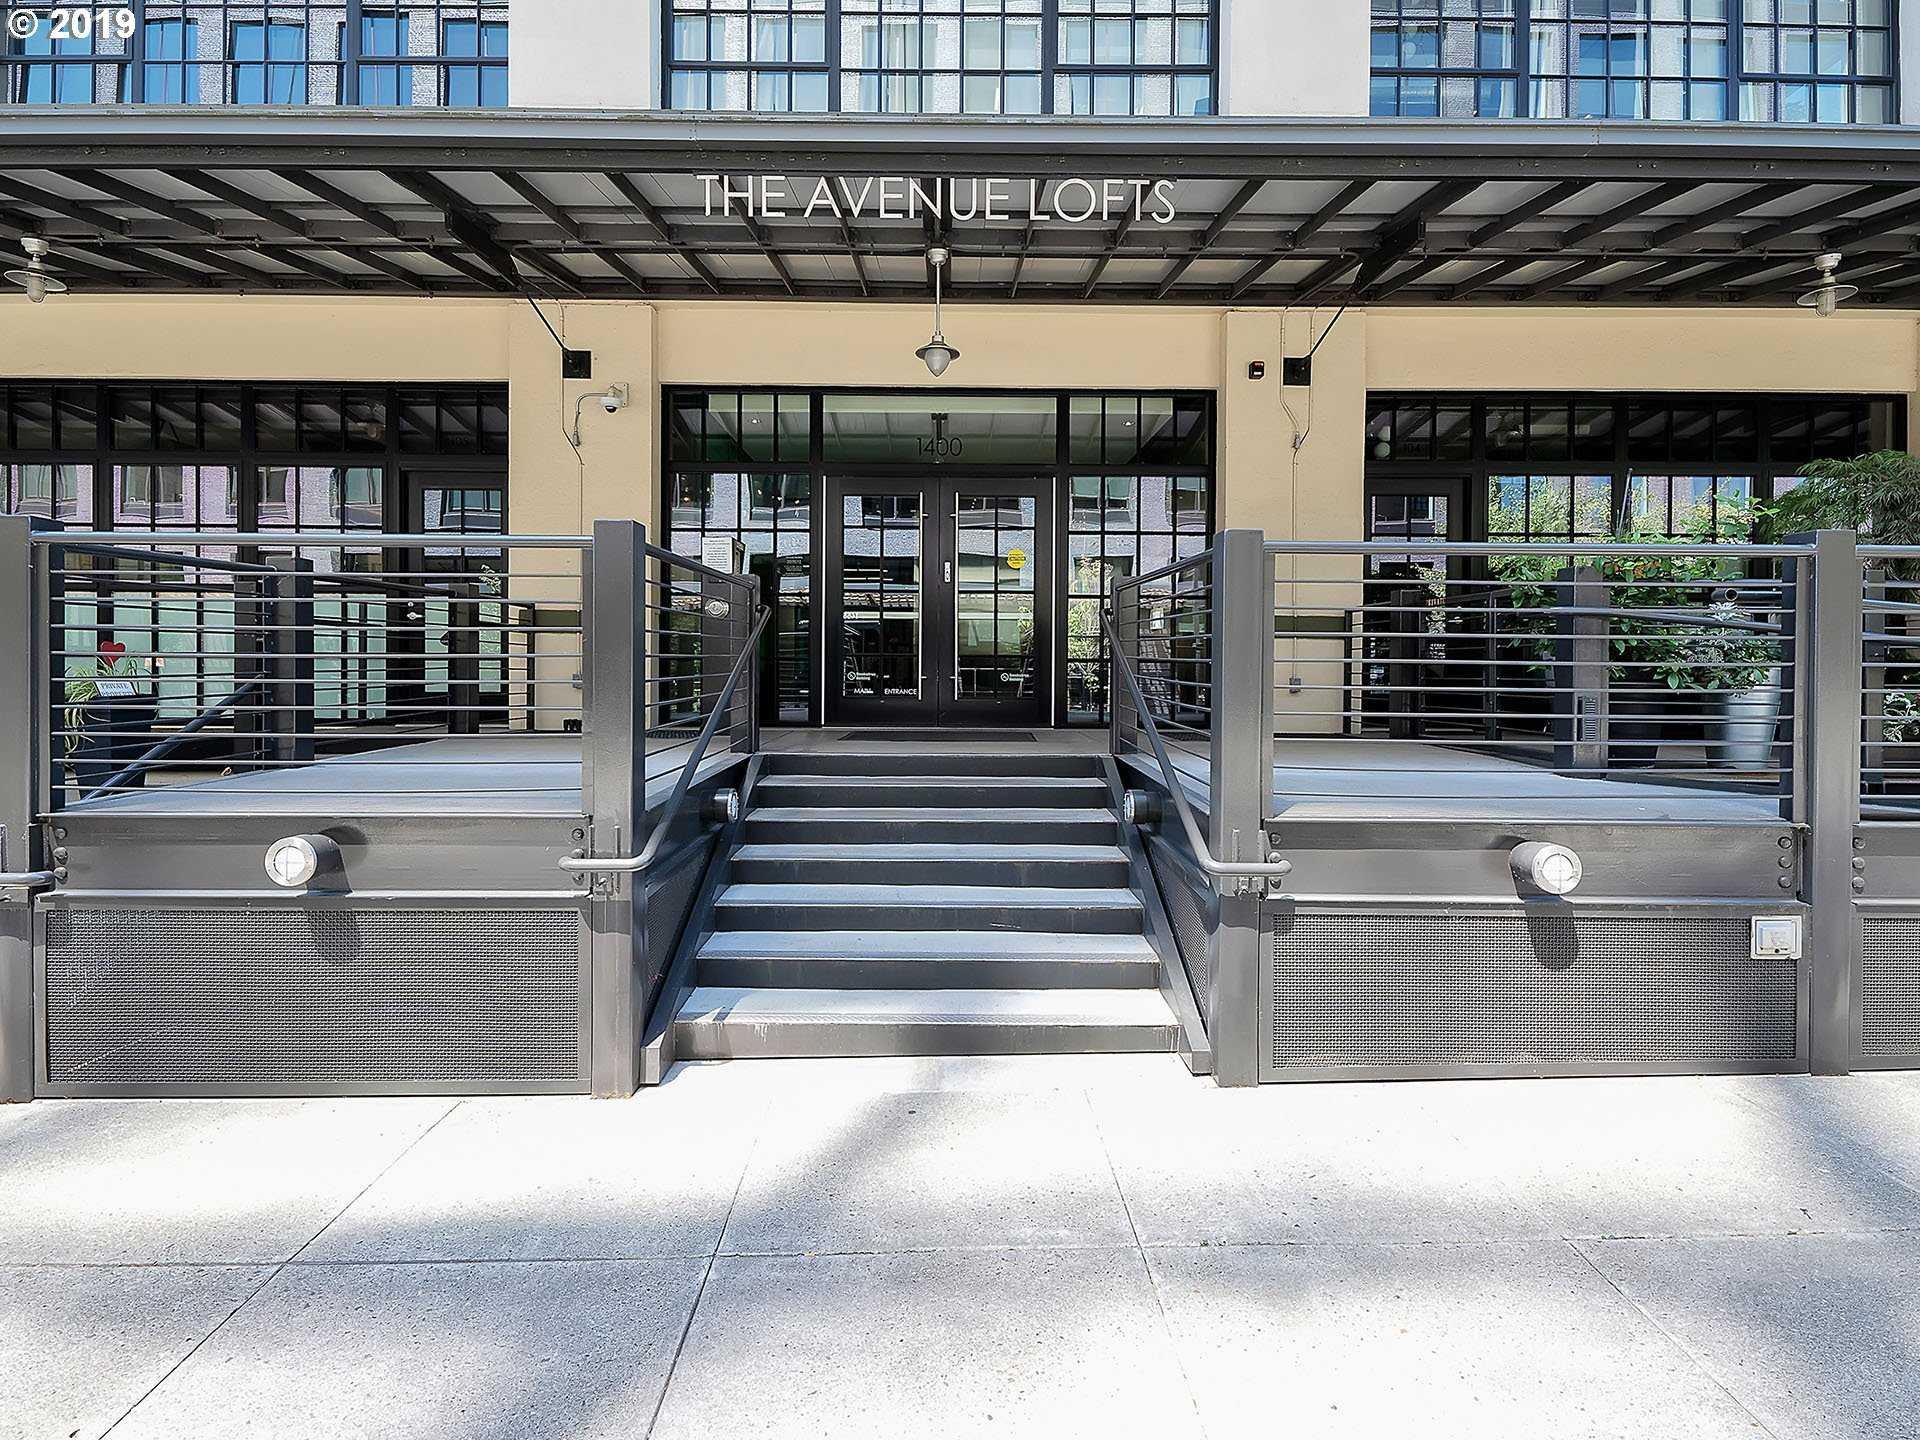 $350,000 - 1Br/1Ba -  for Sale in Avenue Lofts/ Pearl District, Portland